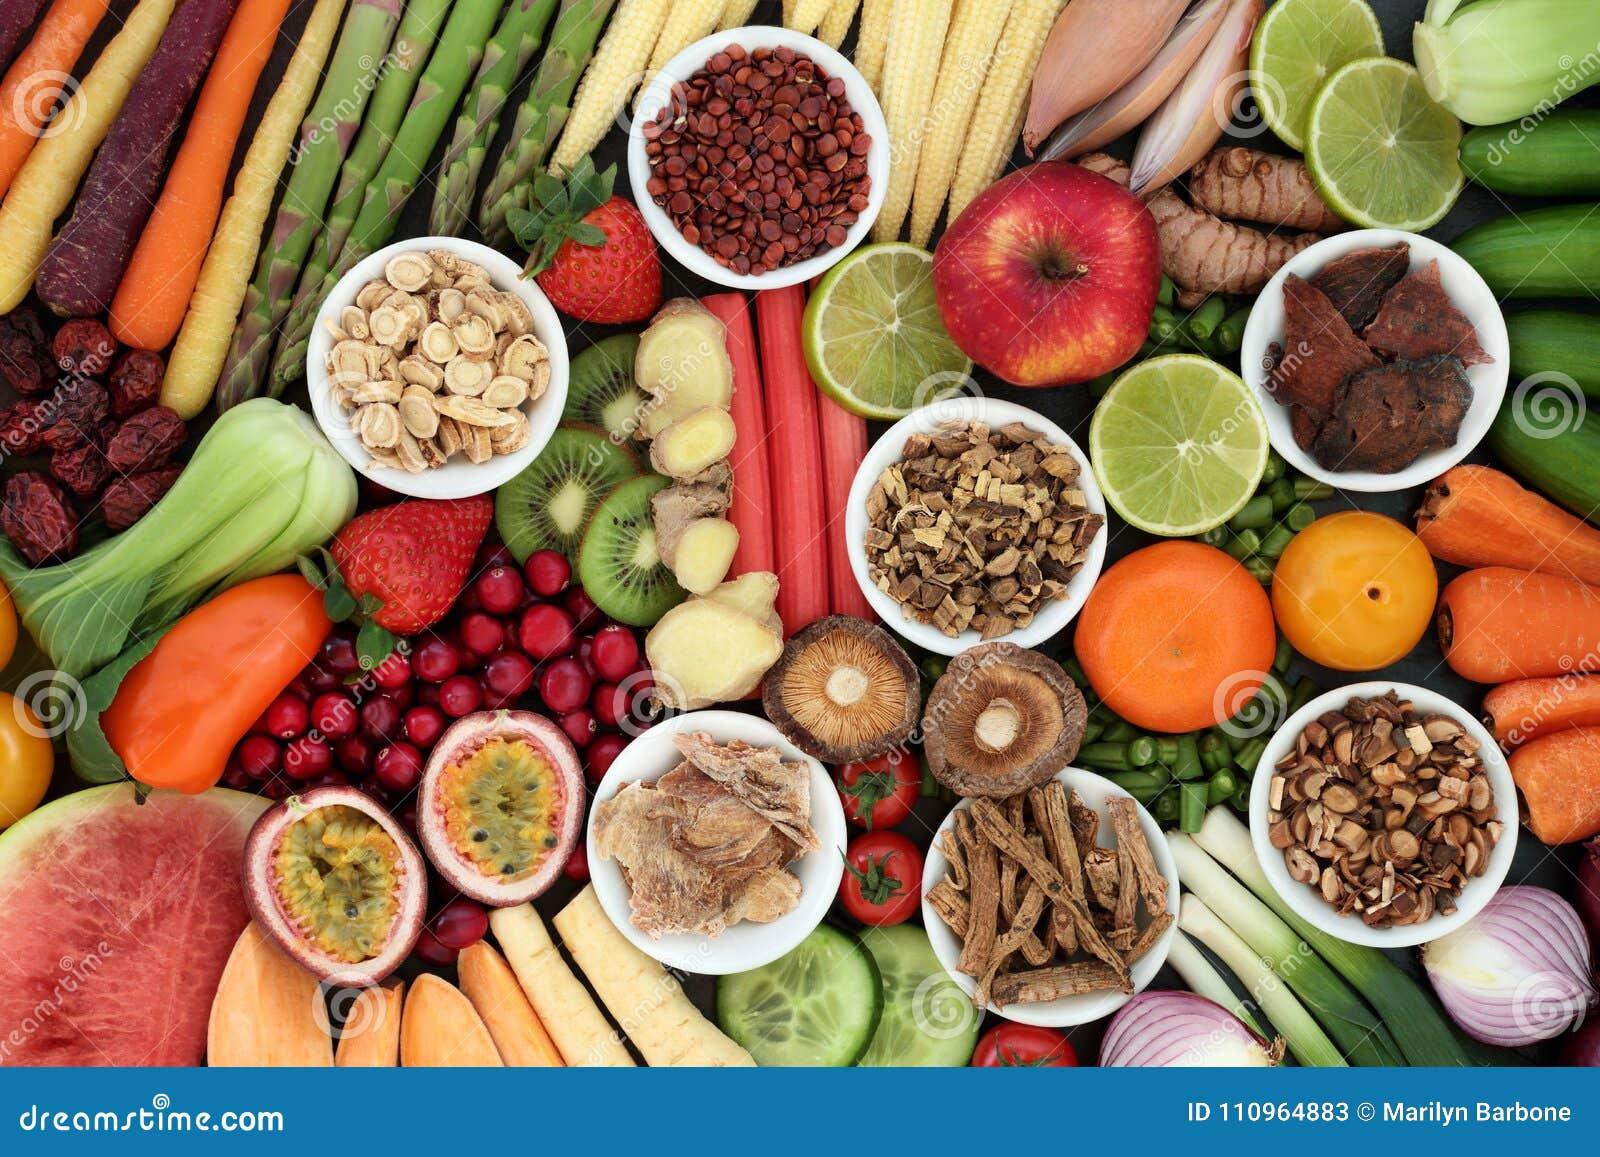 Super Food for Good Health